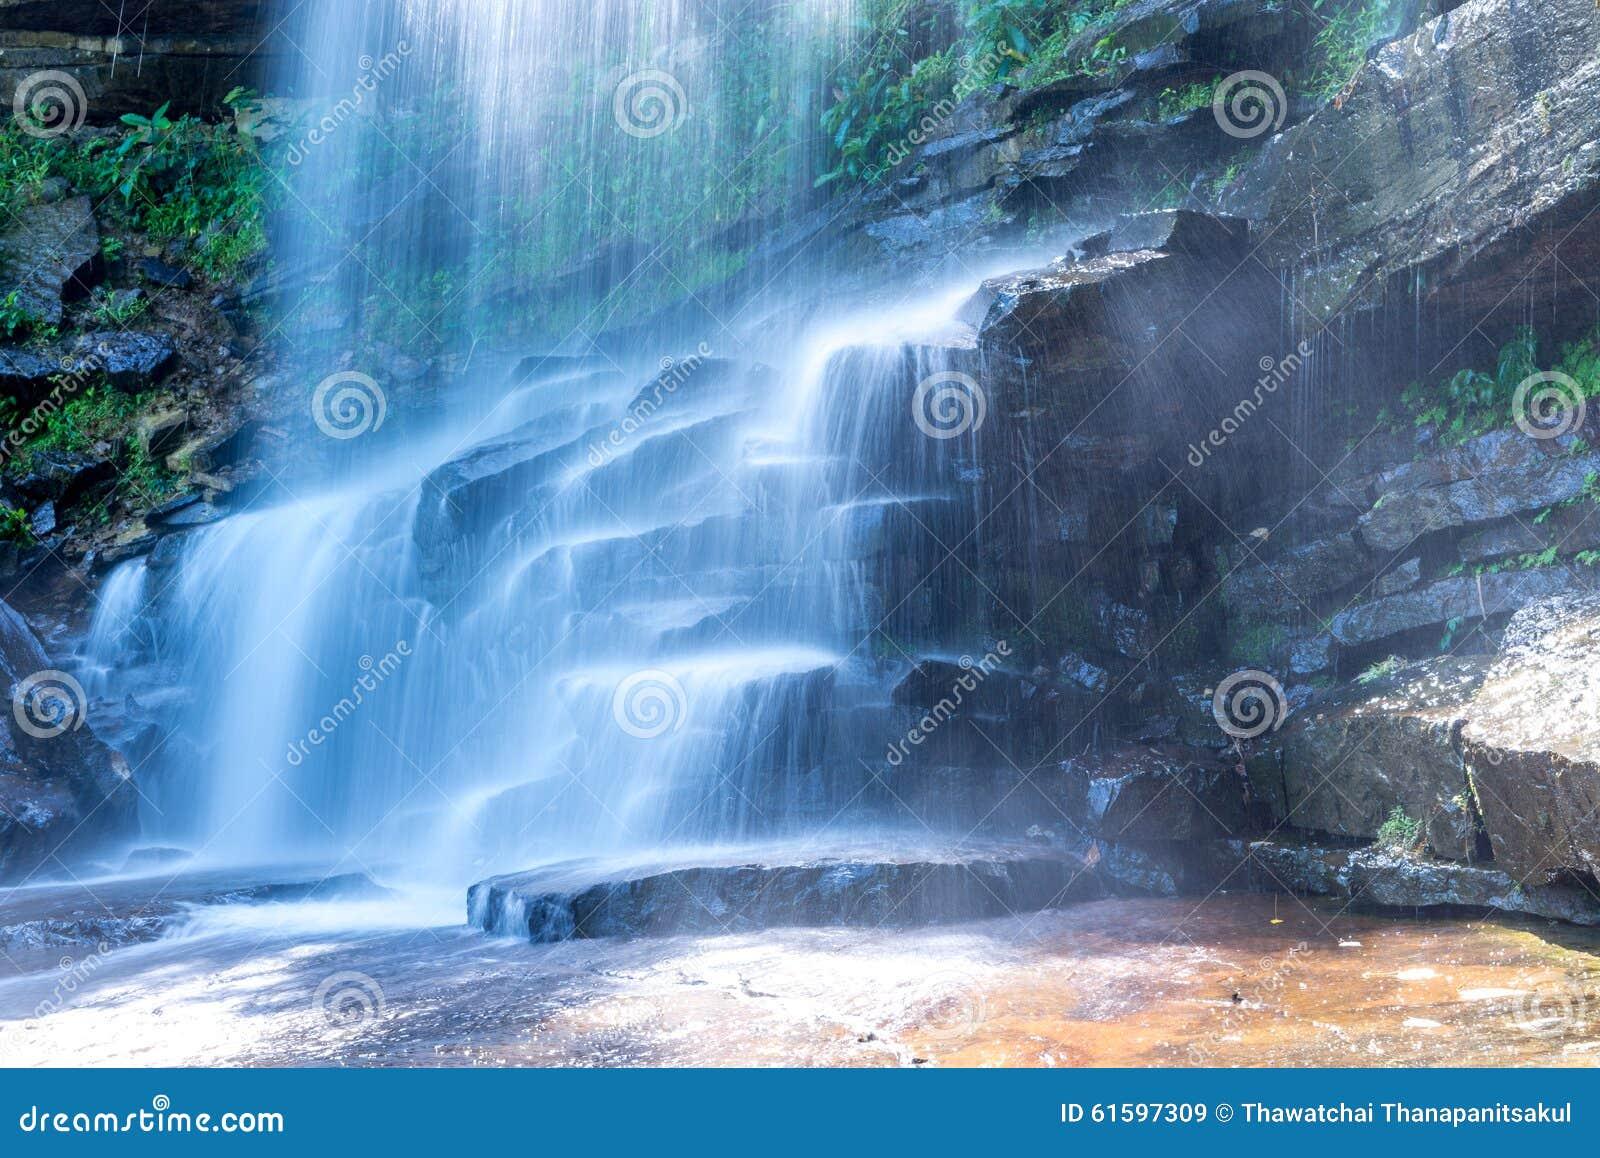 Thmor Tada Waterfall Kampot, Cambodia Oct 2015